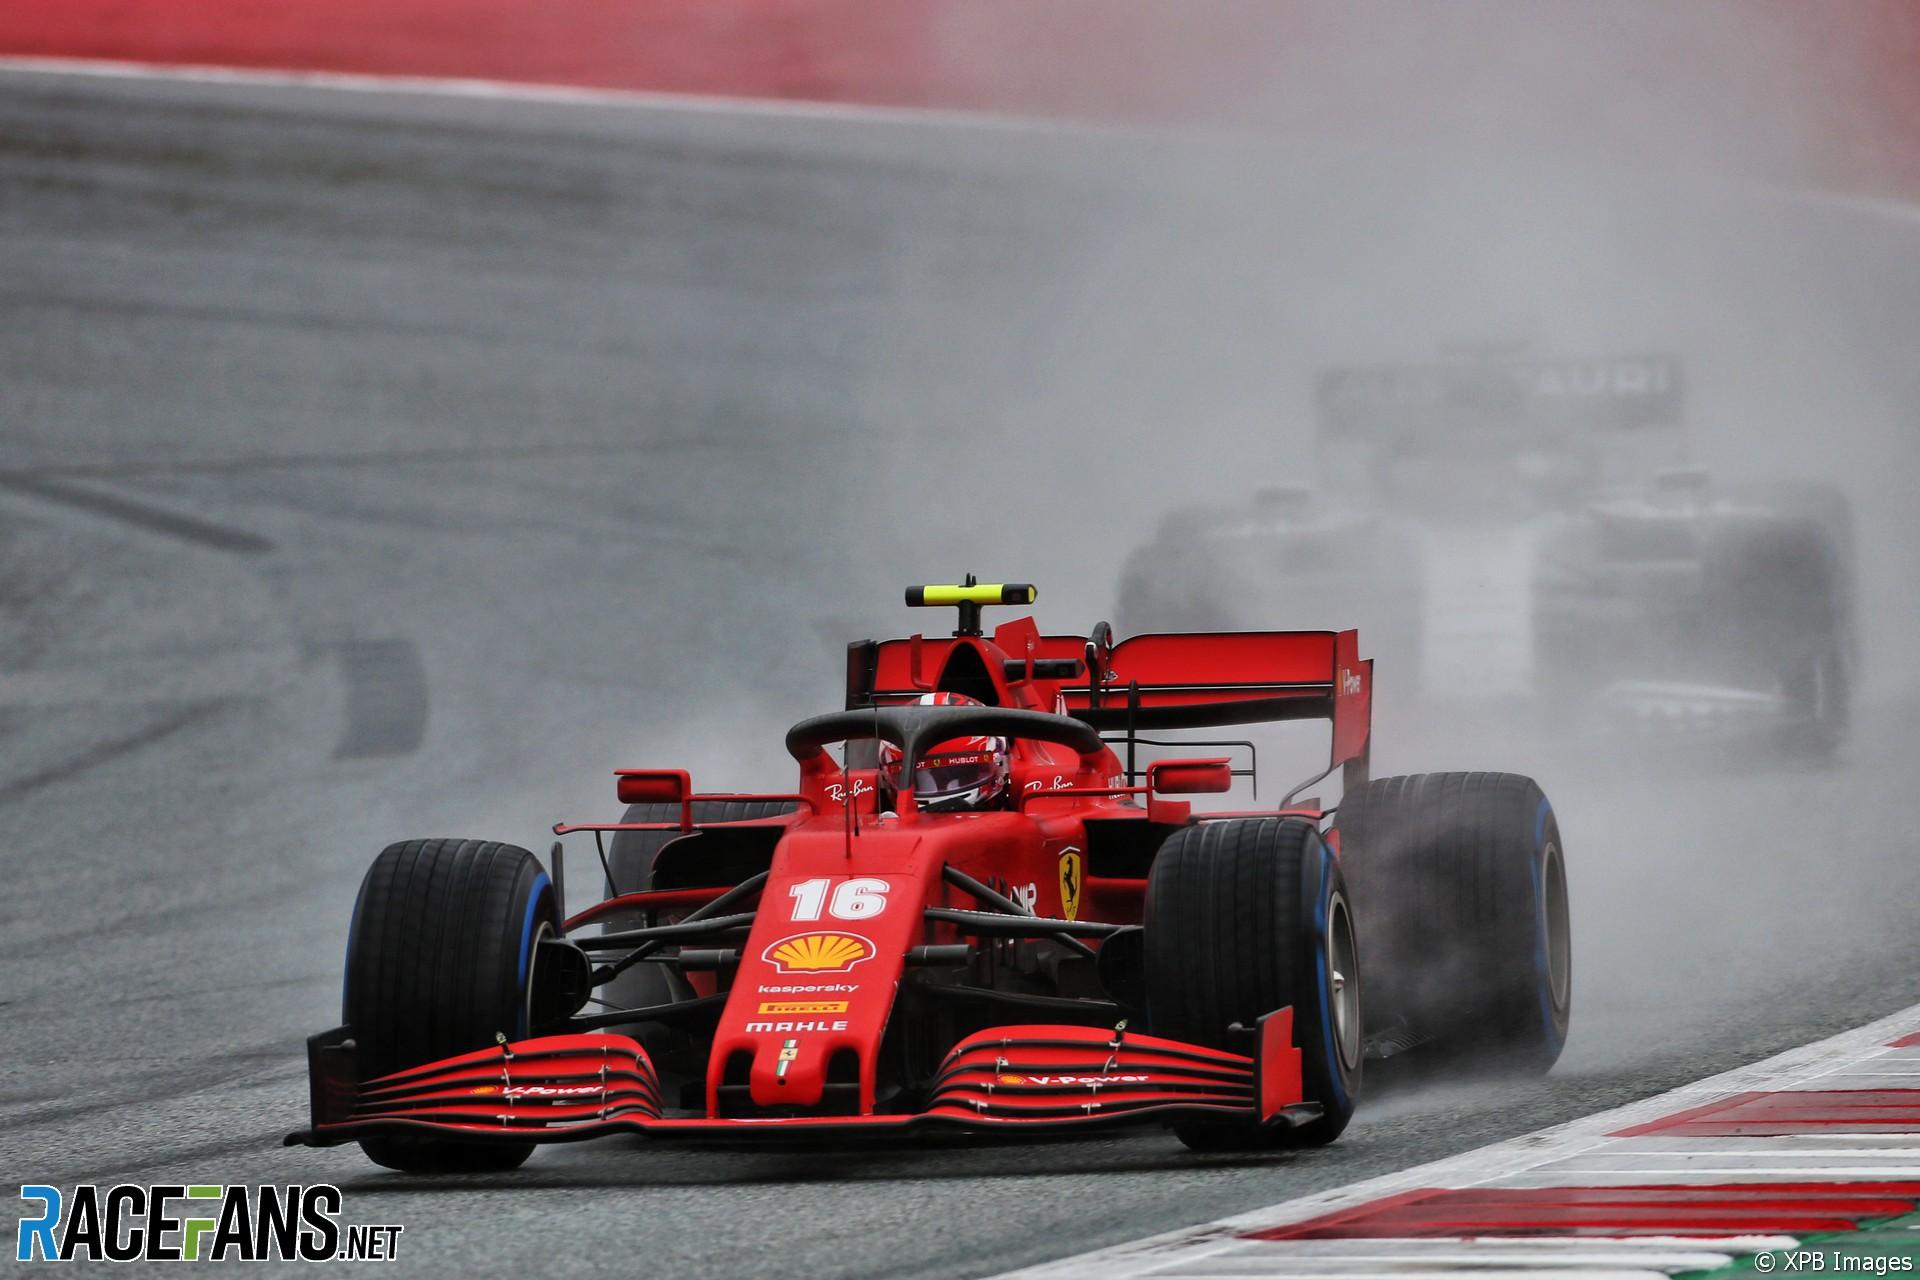 Charles Leclerc, Ferrari, Red Bull Ring, 2020